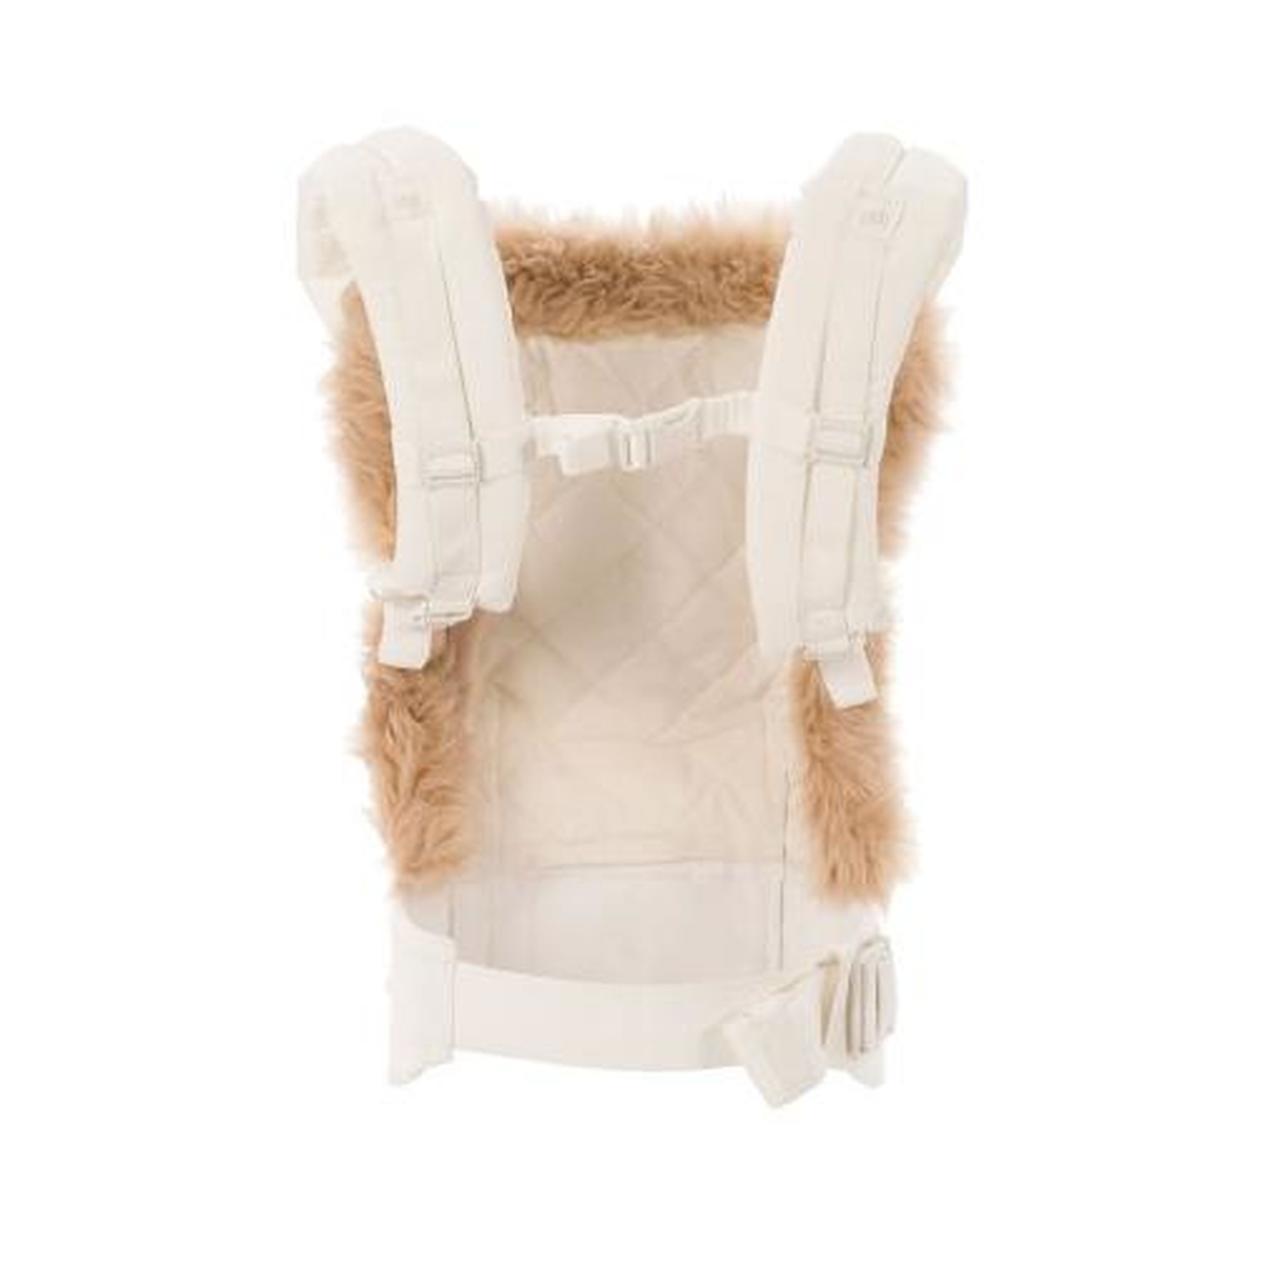 ERGO Baby Carrier & Hand Muff - Winter Edition